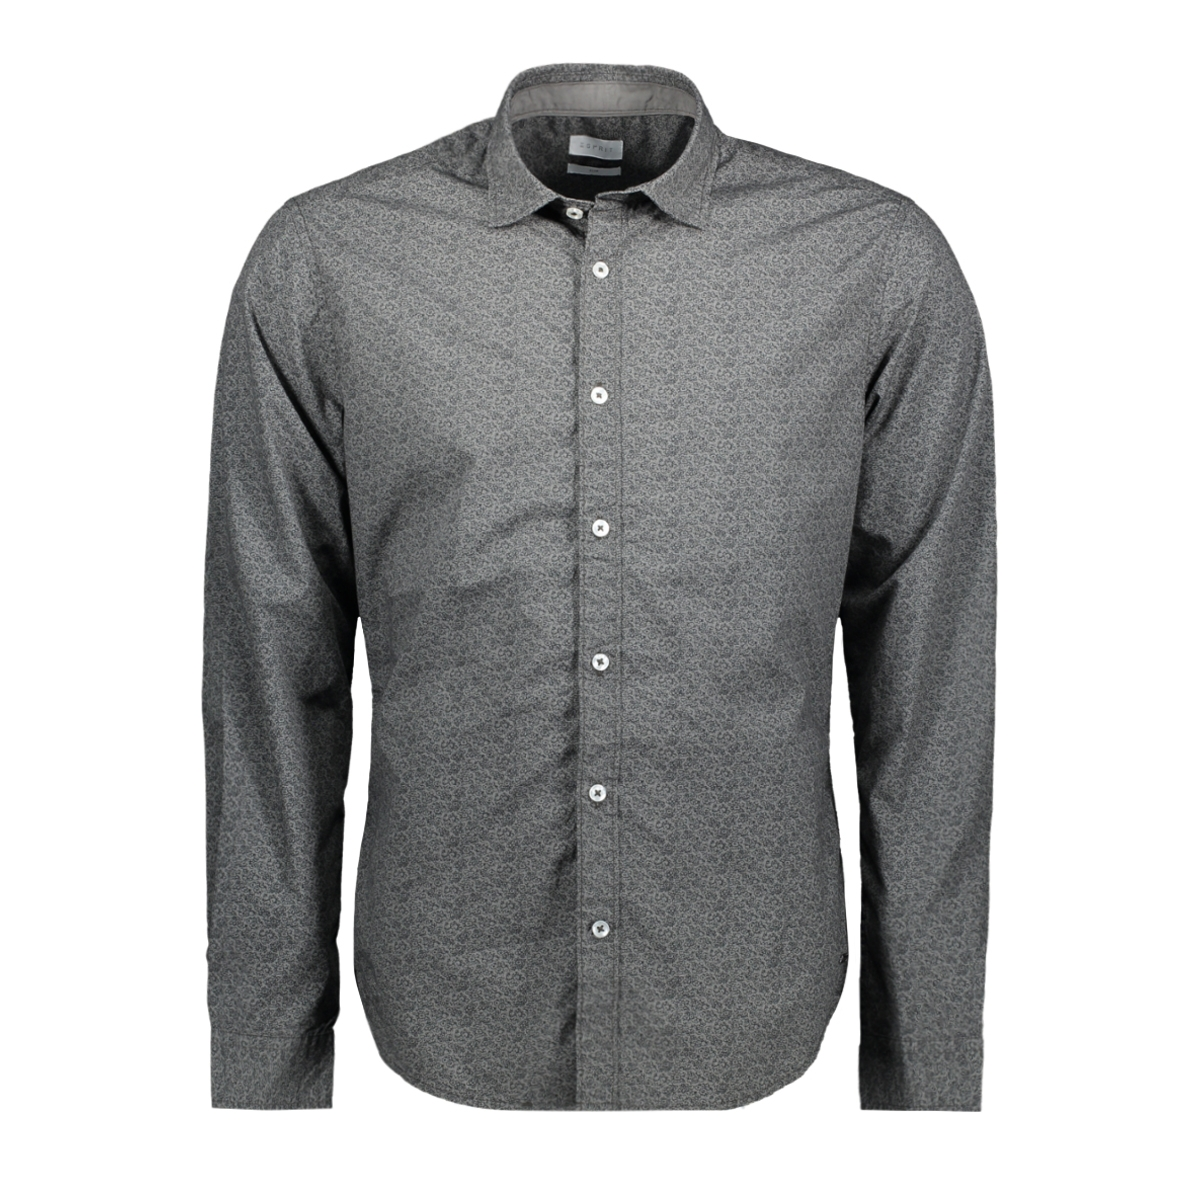 118ee2f007 esprit overhemd e020